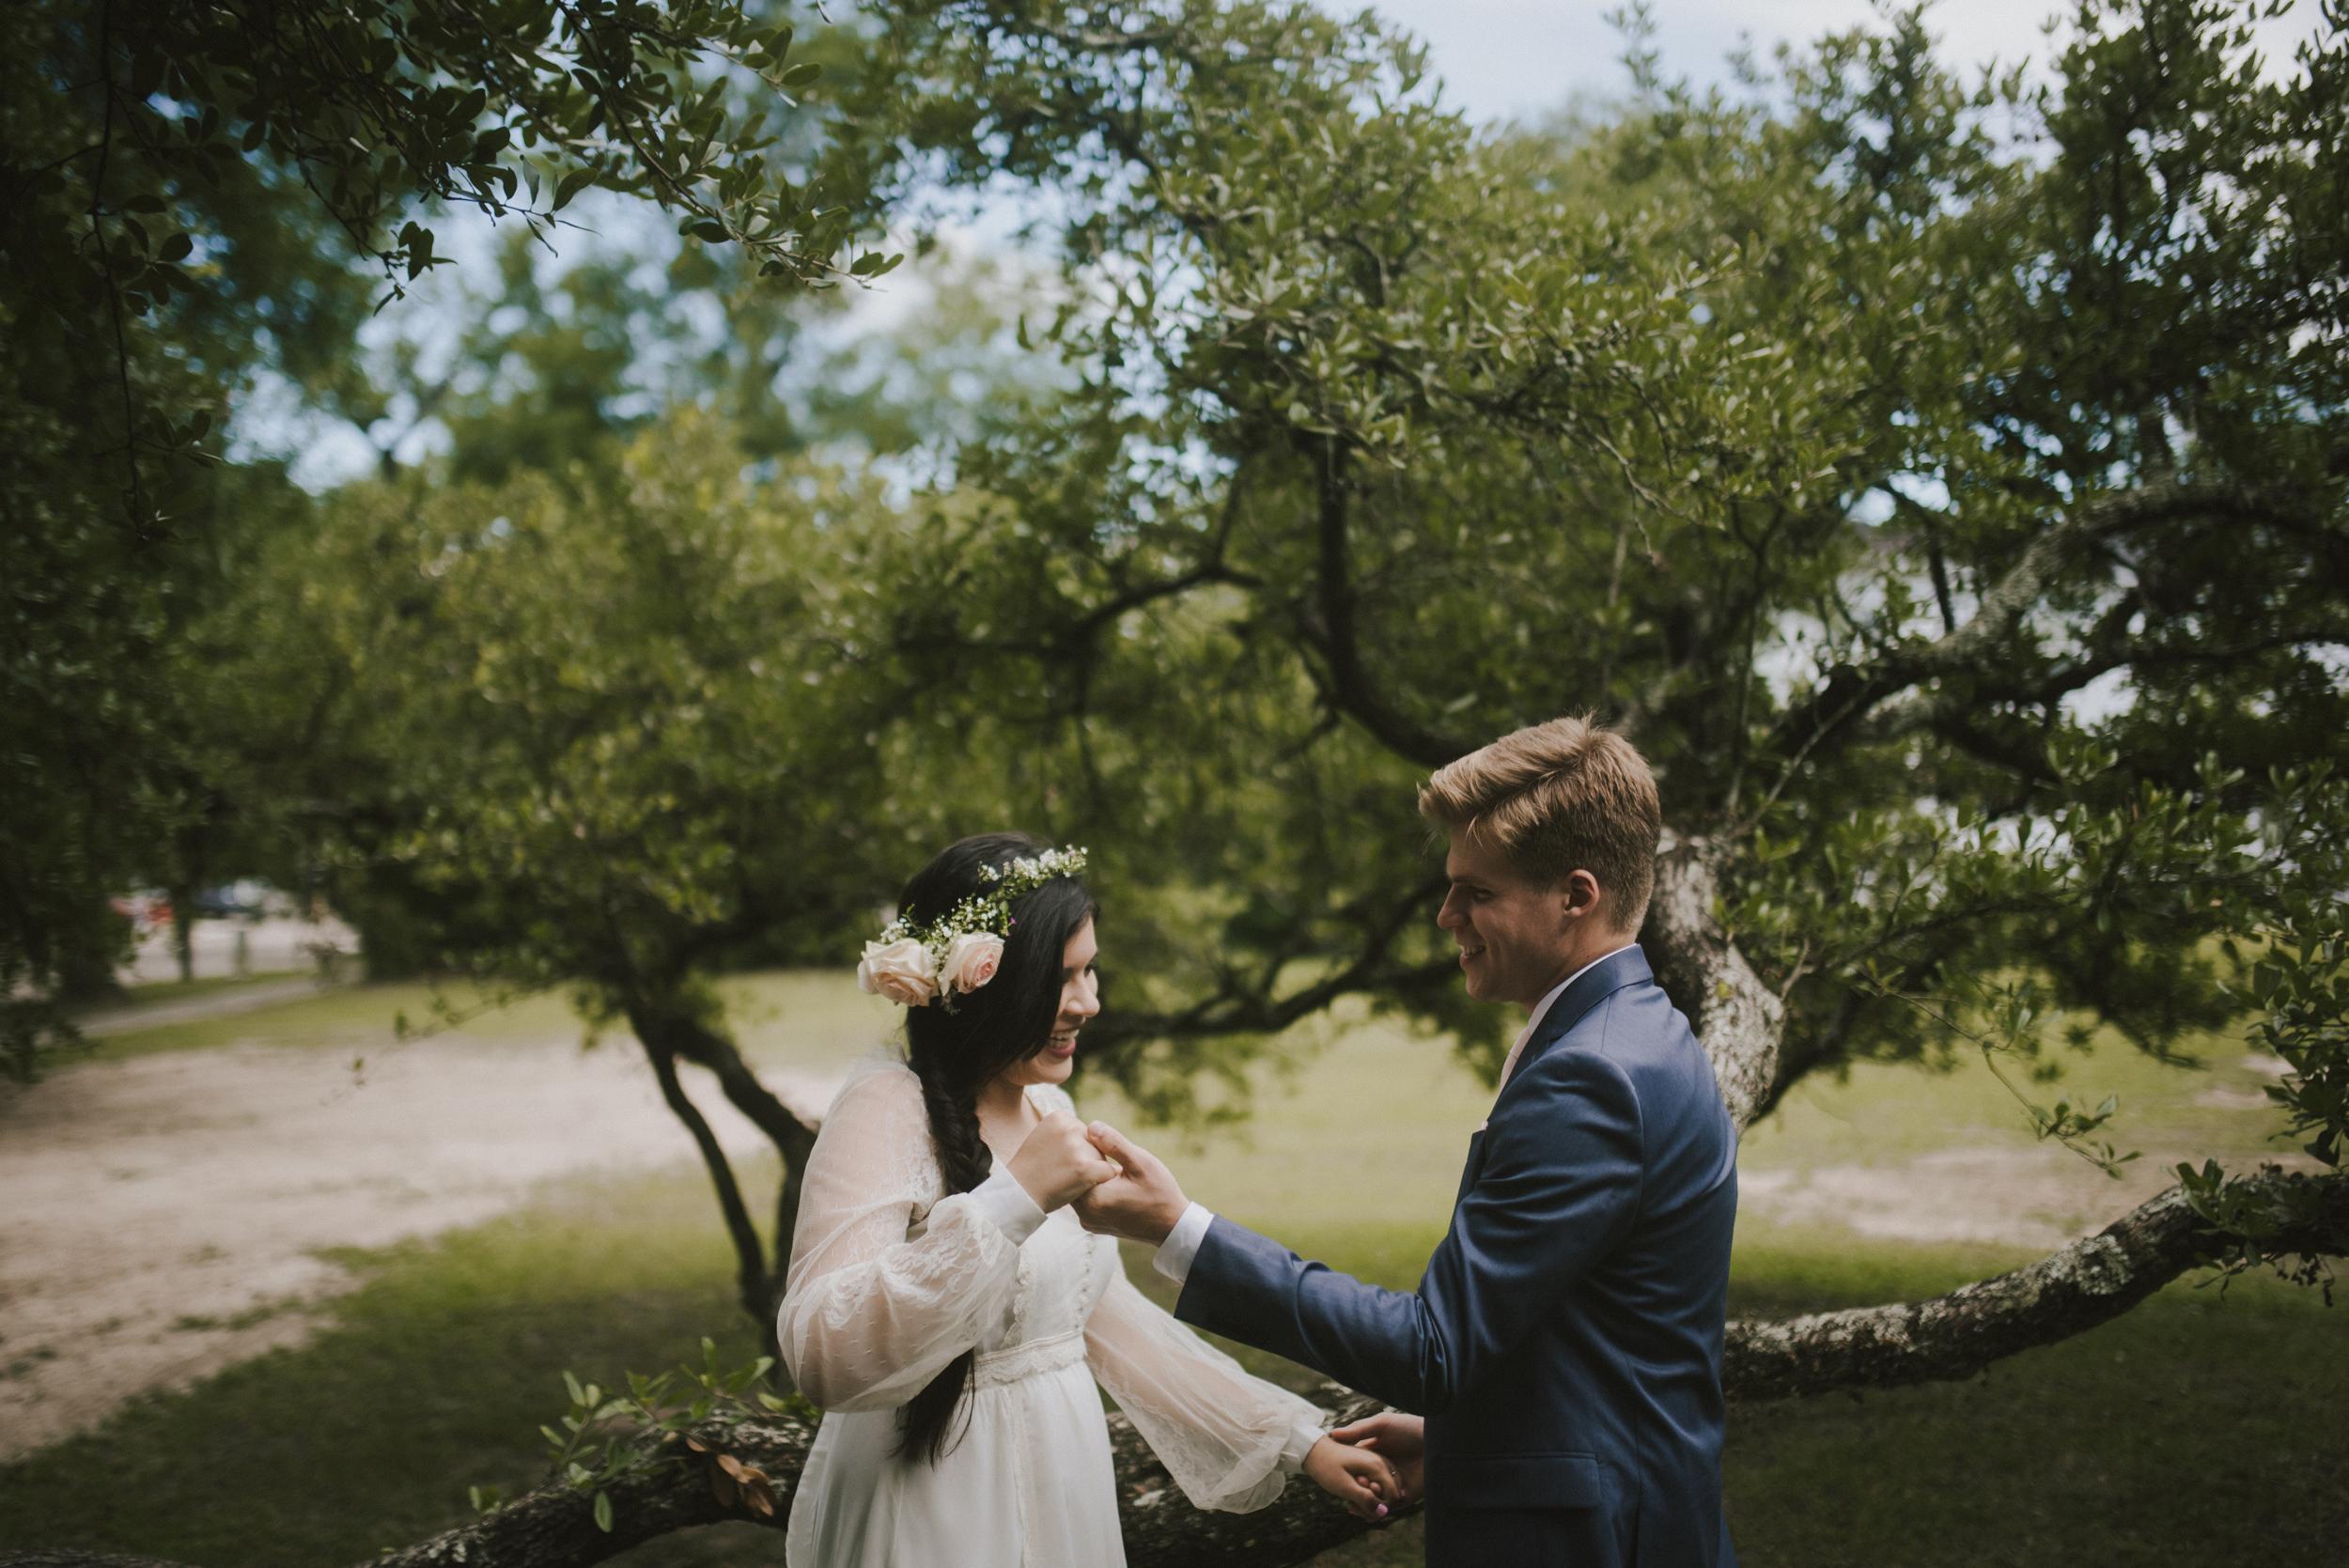 ofRen_weddingphotographer-88.jpg